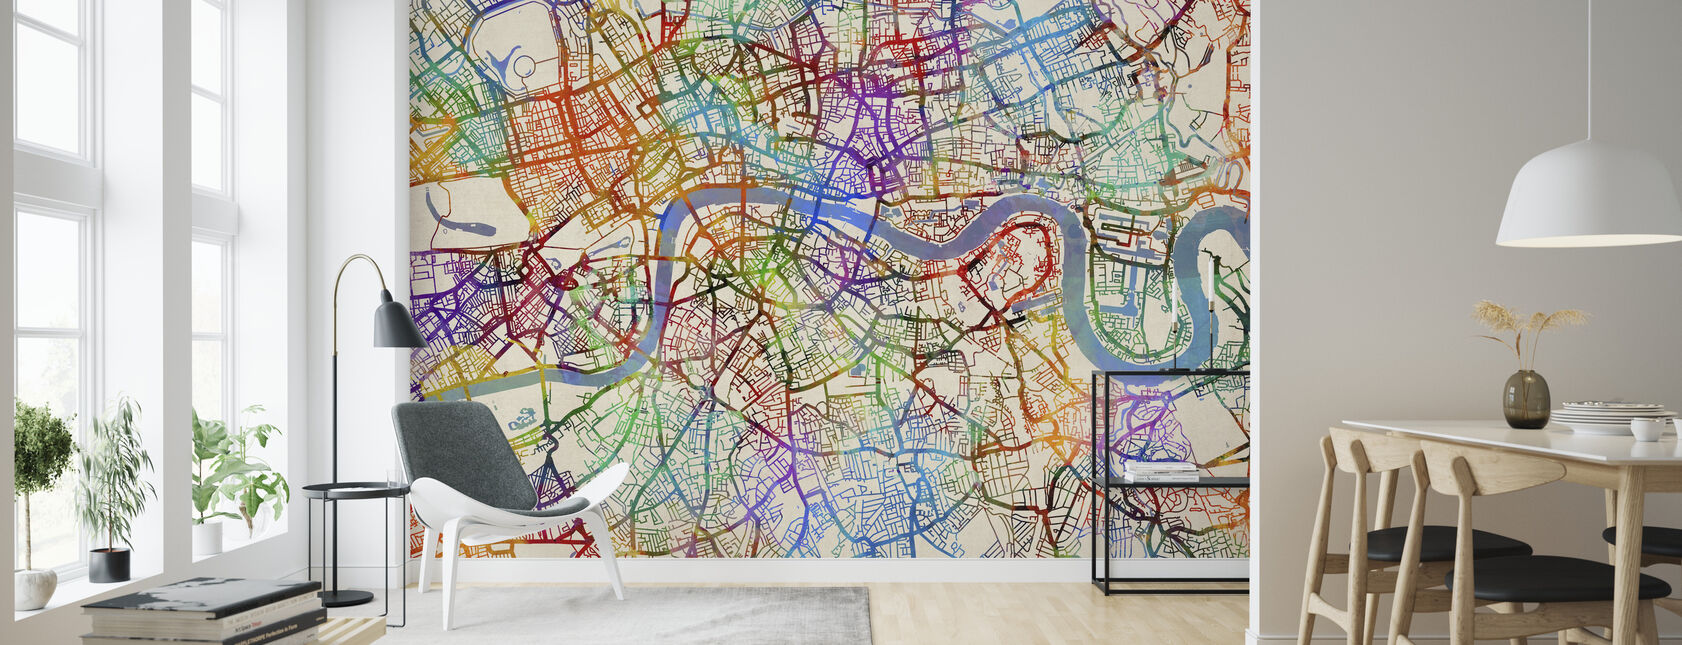 London England Street Map - Wallpaper - Living Room